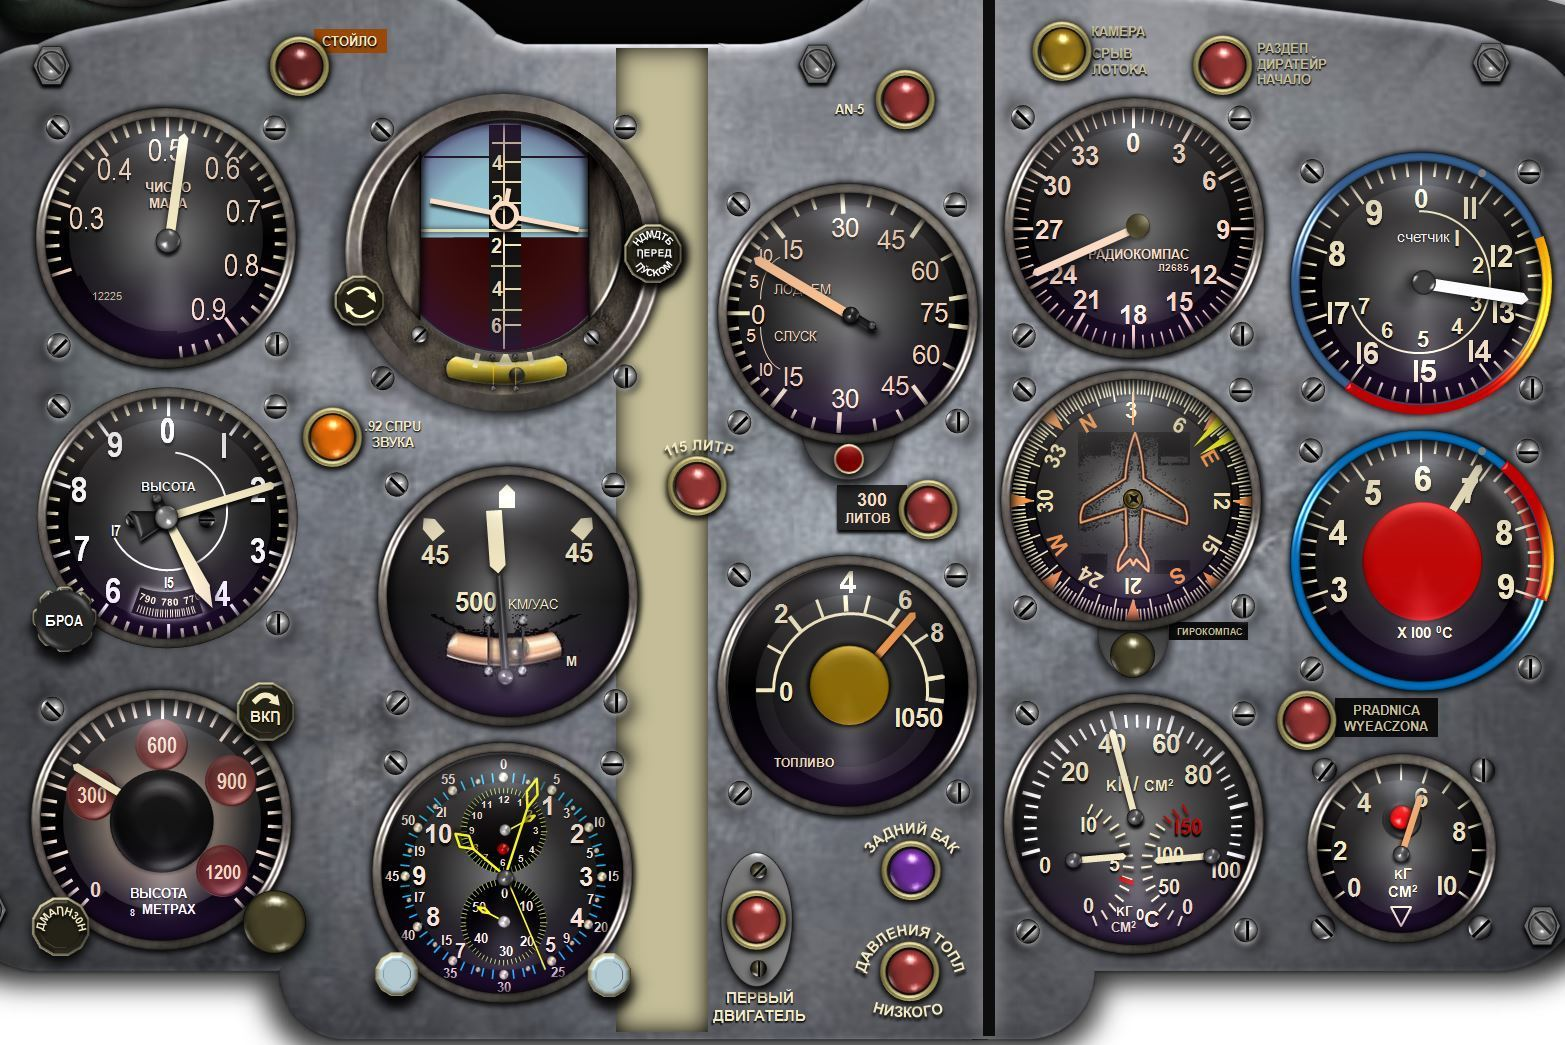 Click image for larger version  Name:MiG15-MiG17-SERIES-COCKPIT-instrument-panel-CDkit-_57-5.jpg Views:45 Size:275.1 KB ID:2250525